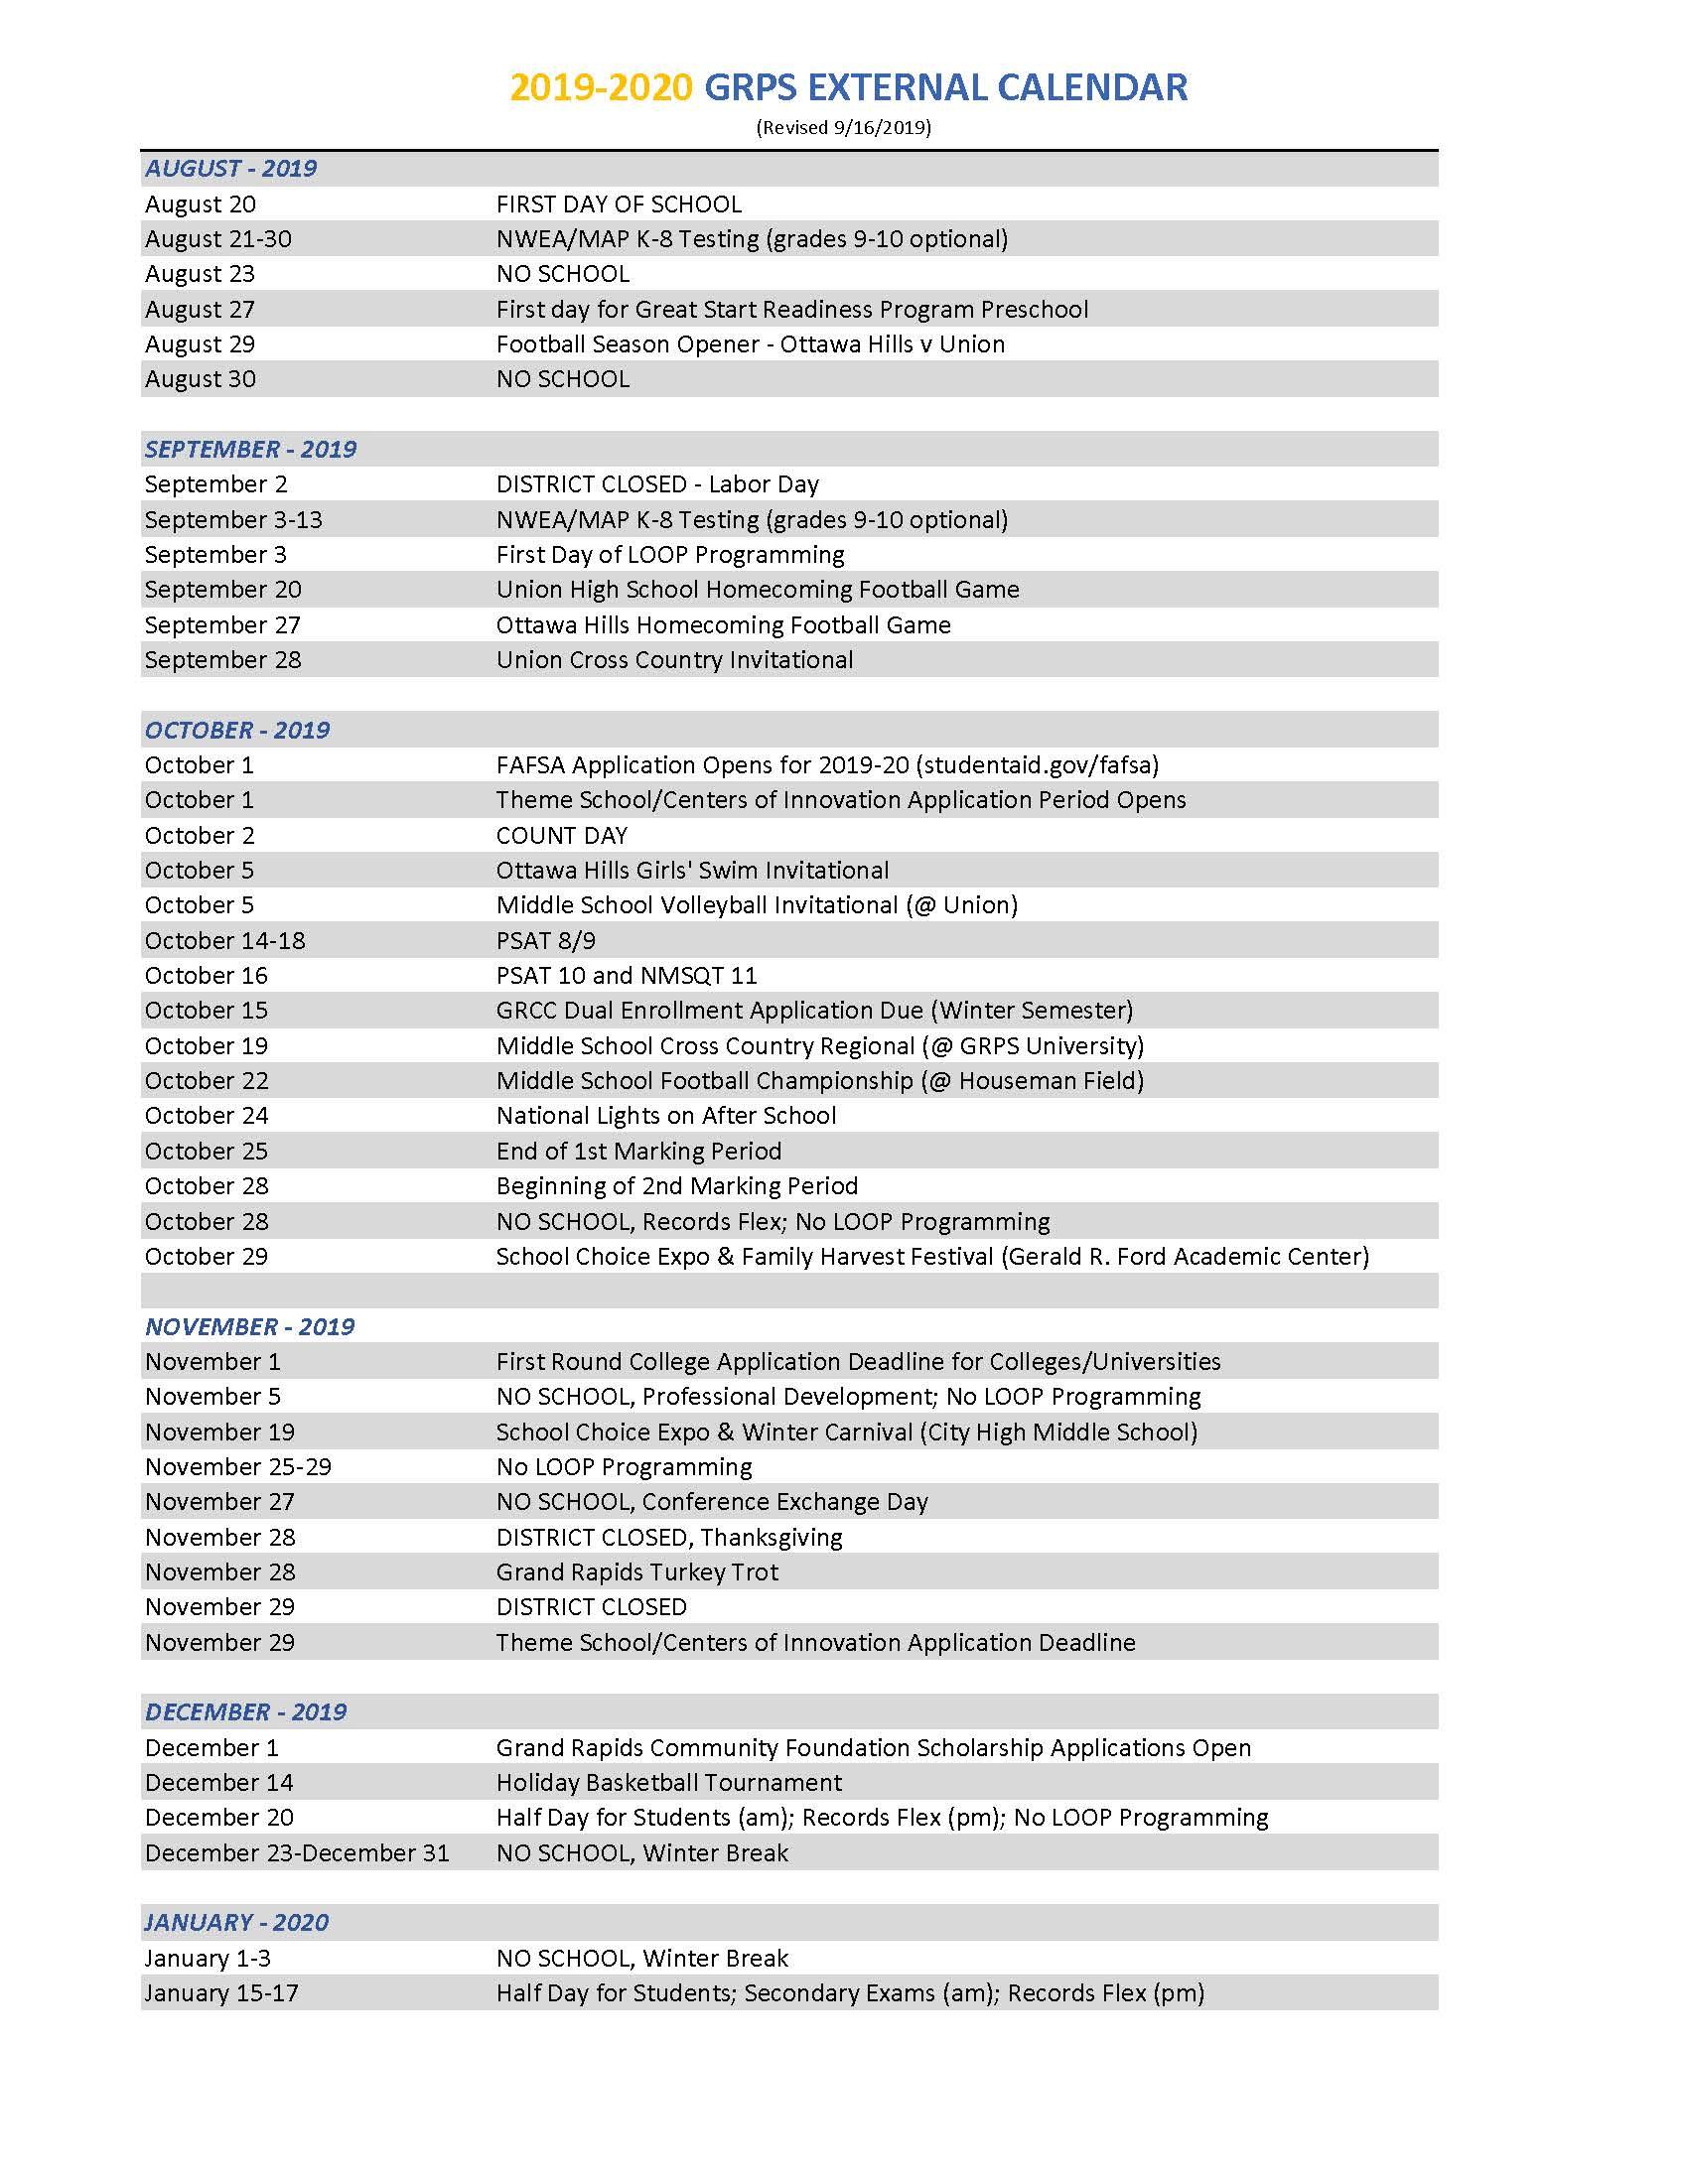 2019 2020 District Calendar Throughout Spring Break For Grand Rapids Public Schools